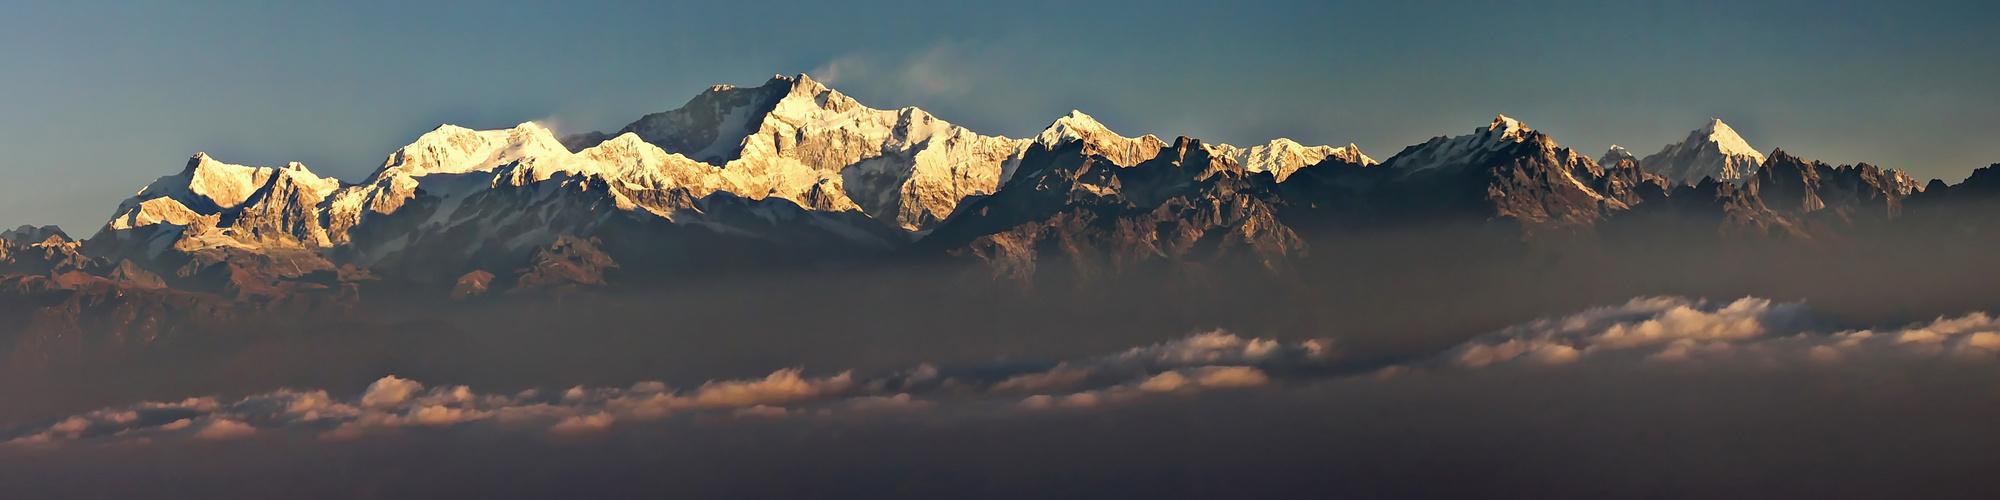 Kangchendzönga Massiv 8586m